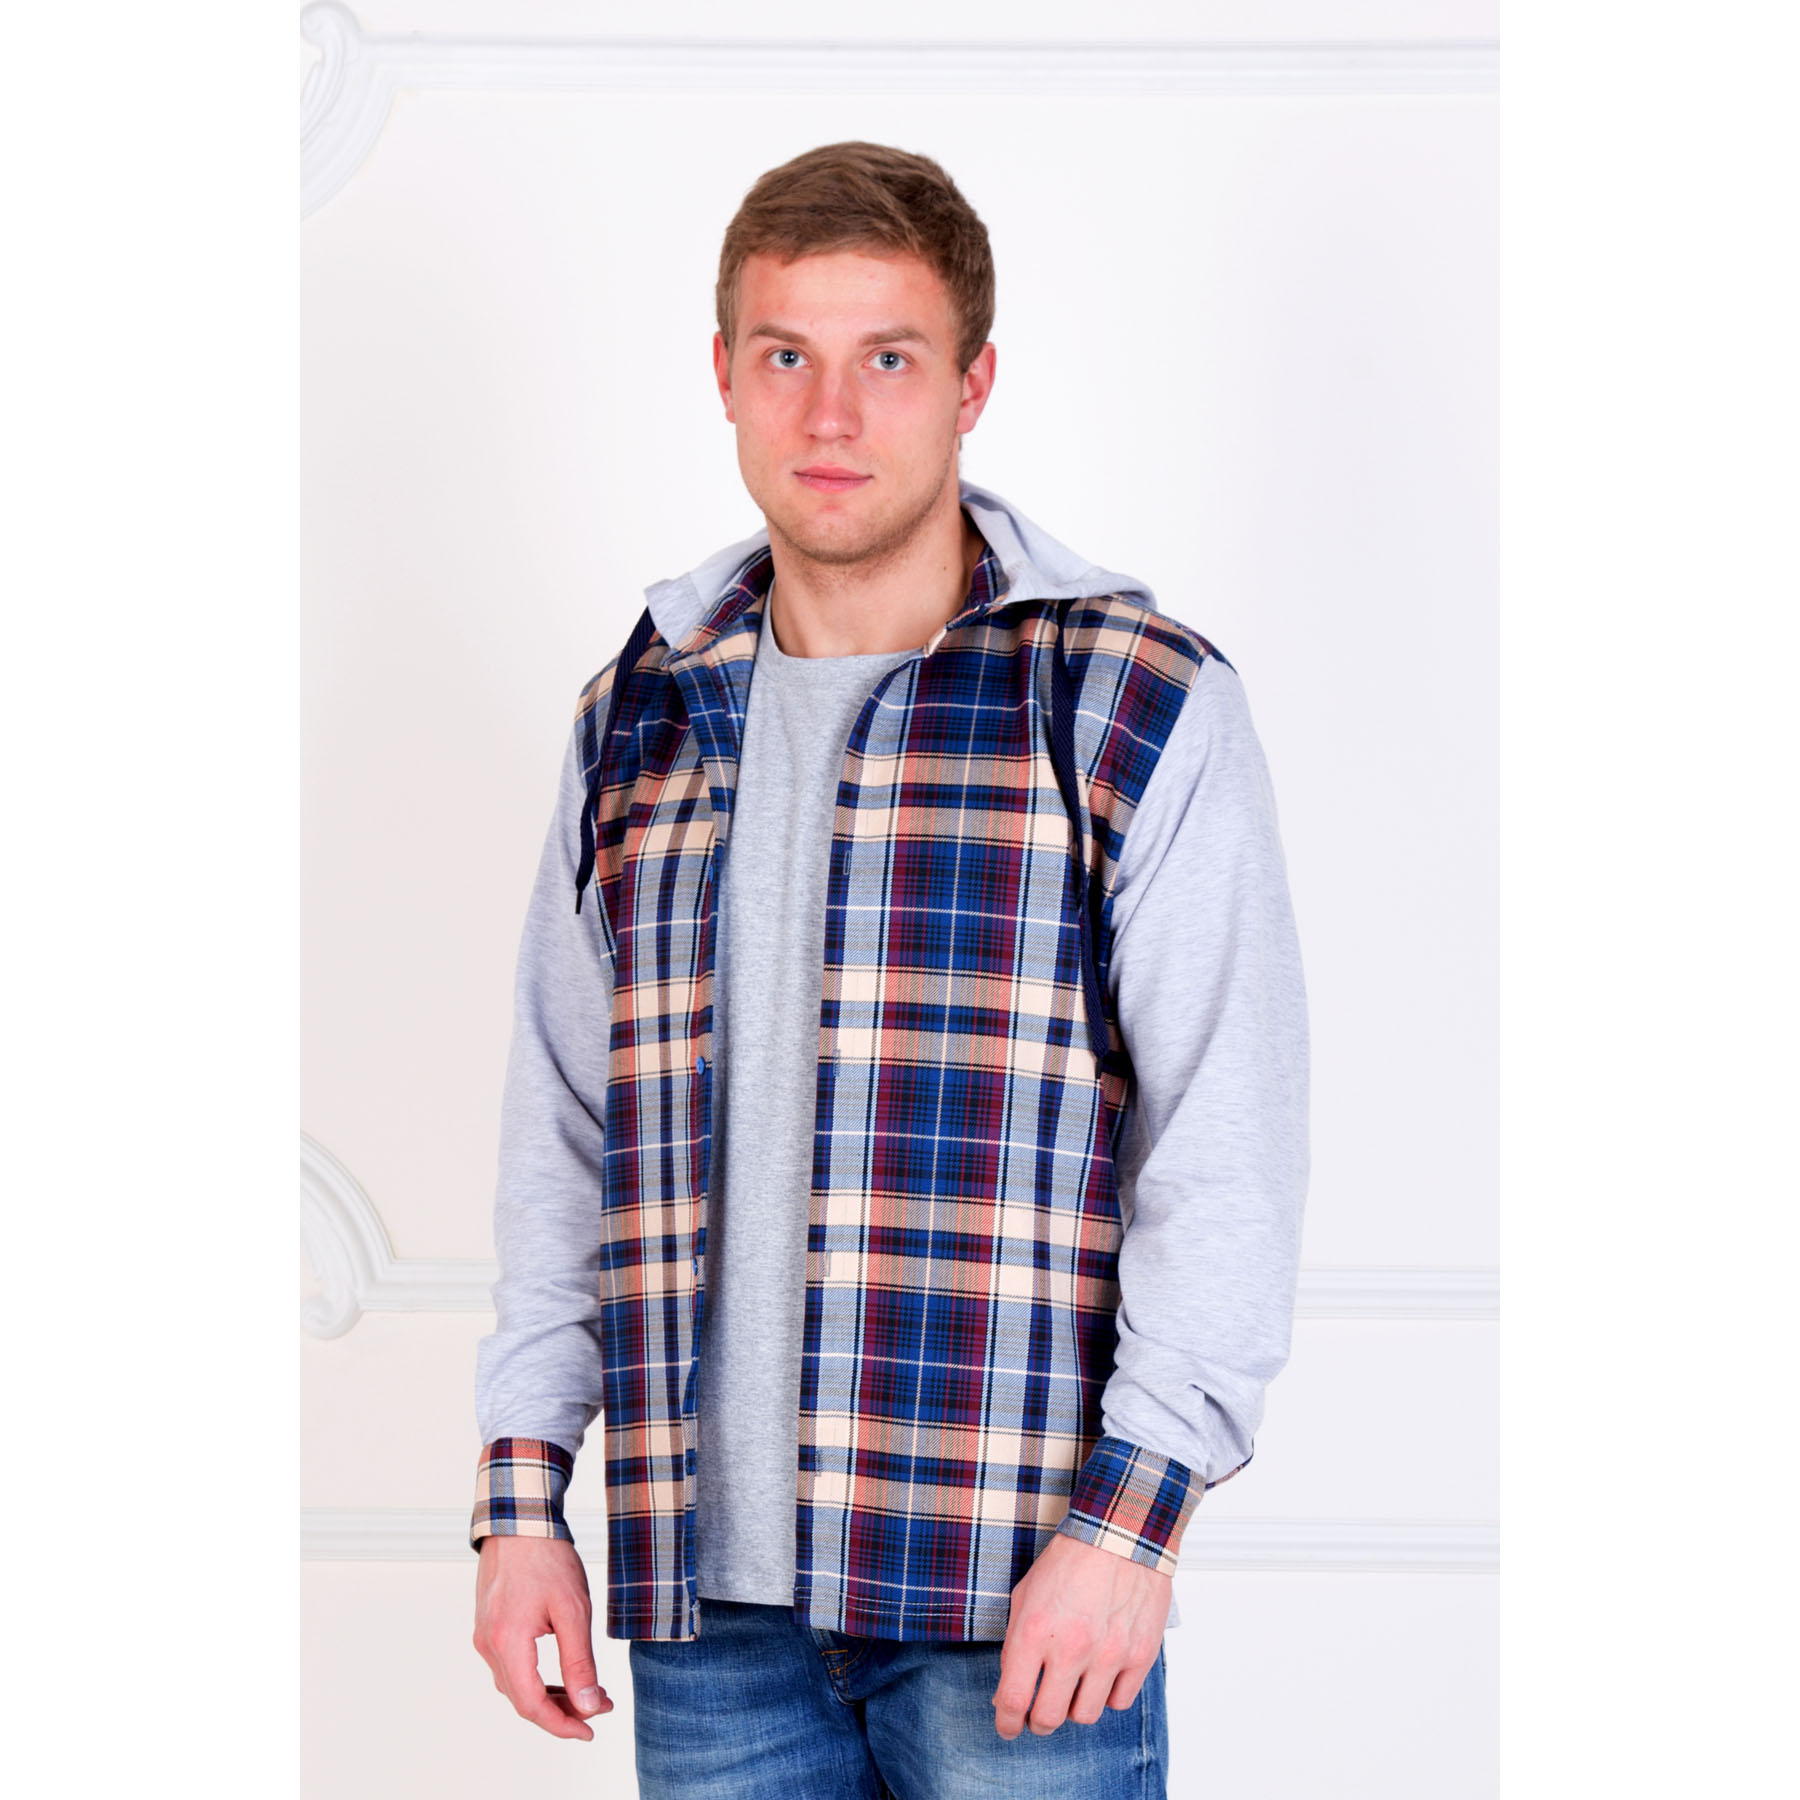 Мужская рубашка «Адриан» , размер 42Рубашки<br>Обхват груди:84 см<br>Обхват талии:84 см<br>Обхват бедер:88 см<br>Рост:170-176 см<br><br>Тип: Муж. рубашка<br>Размер: 42<br>Материал: Шотландка